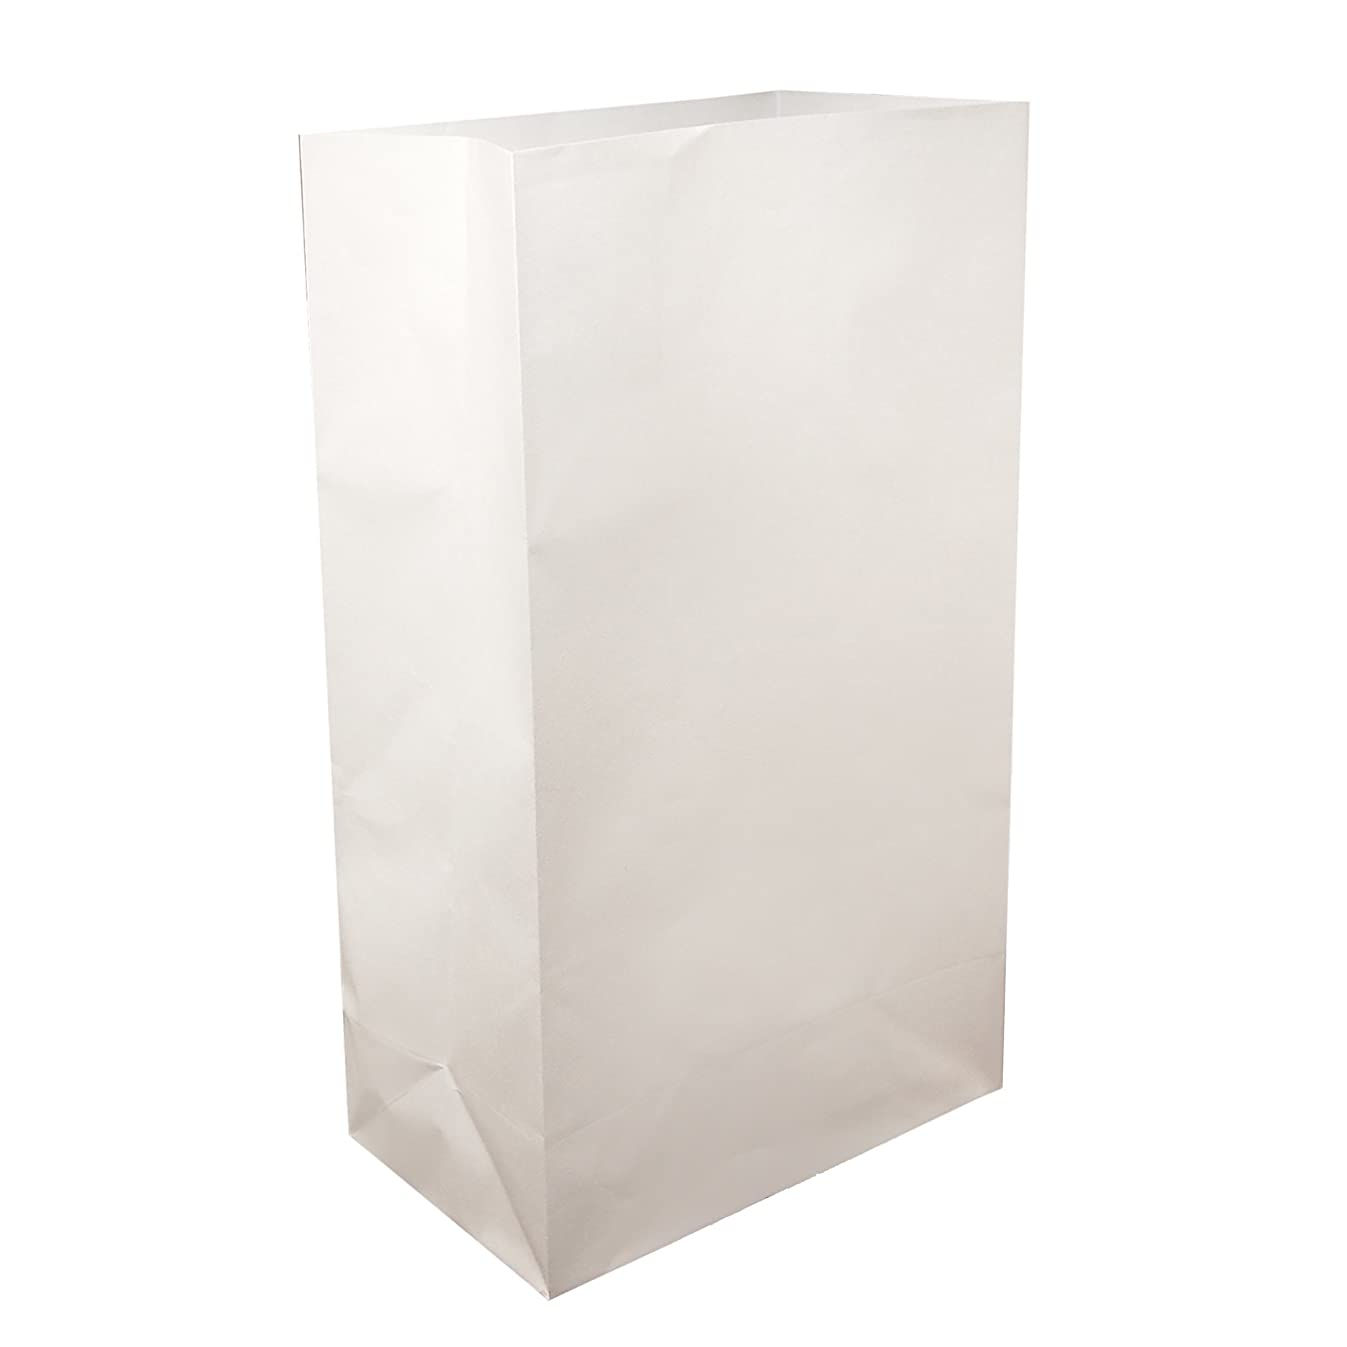 Lumabase 00410 100 Count Standard Luminaria Bags, White